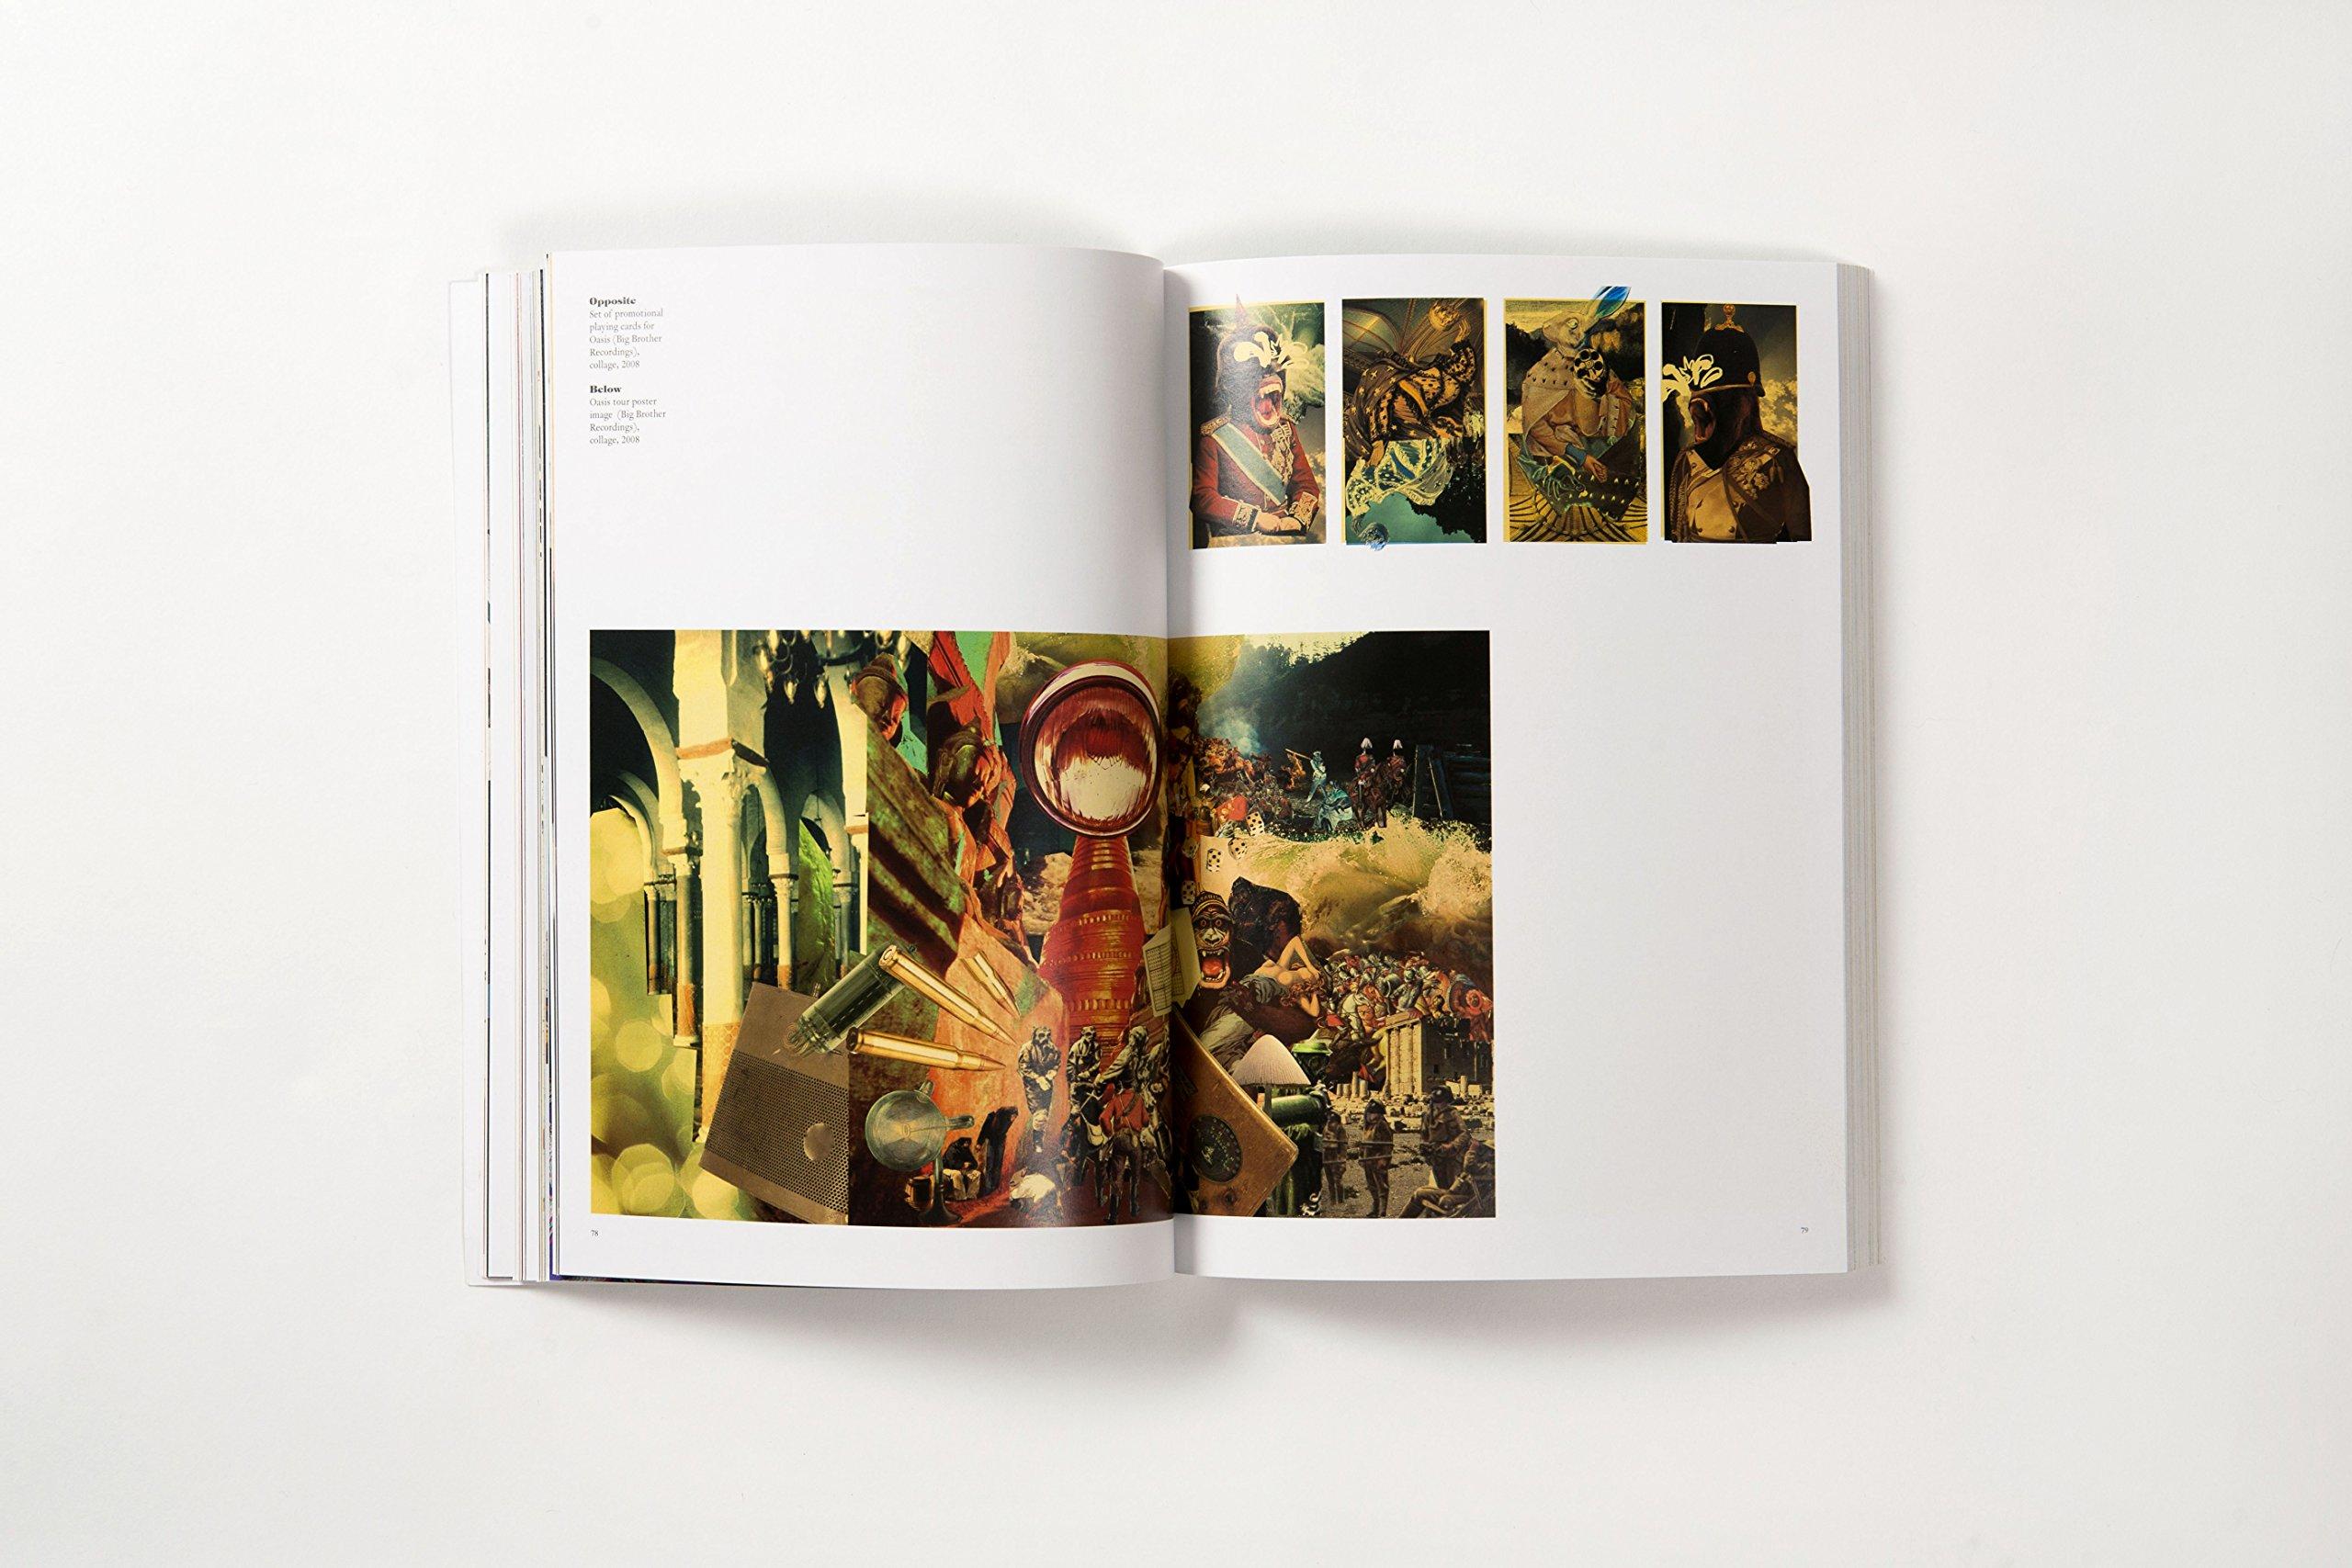 Cut paste paperback 21st century collage amazon richard cut paste paperback 21st century collage amazon richard brereton caroline roberts 9781780672366 books fandeluxe Gallery